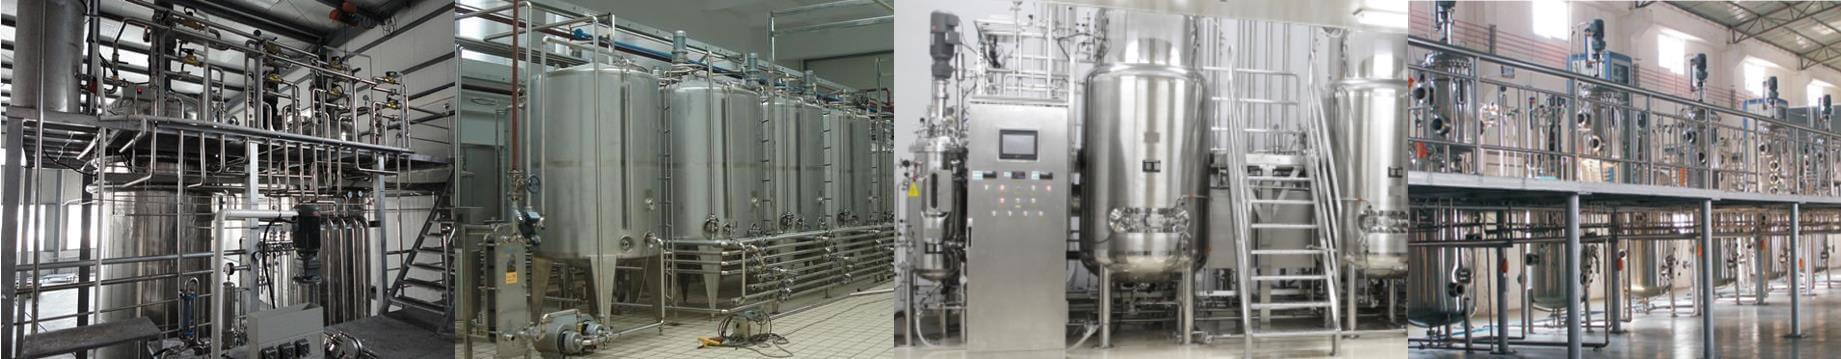 bioreactor-fermentor-project